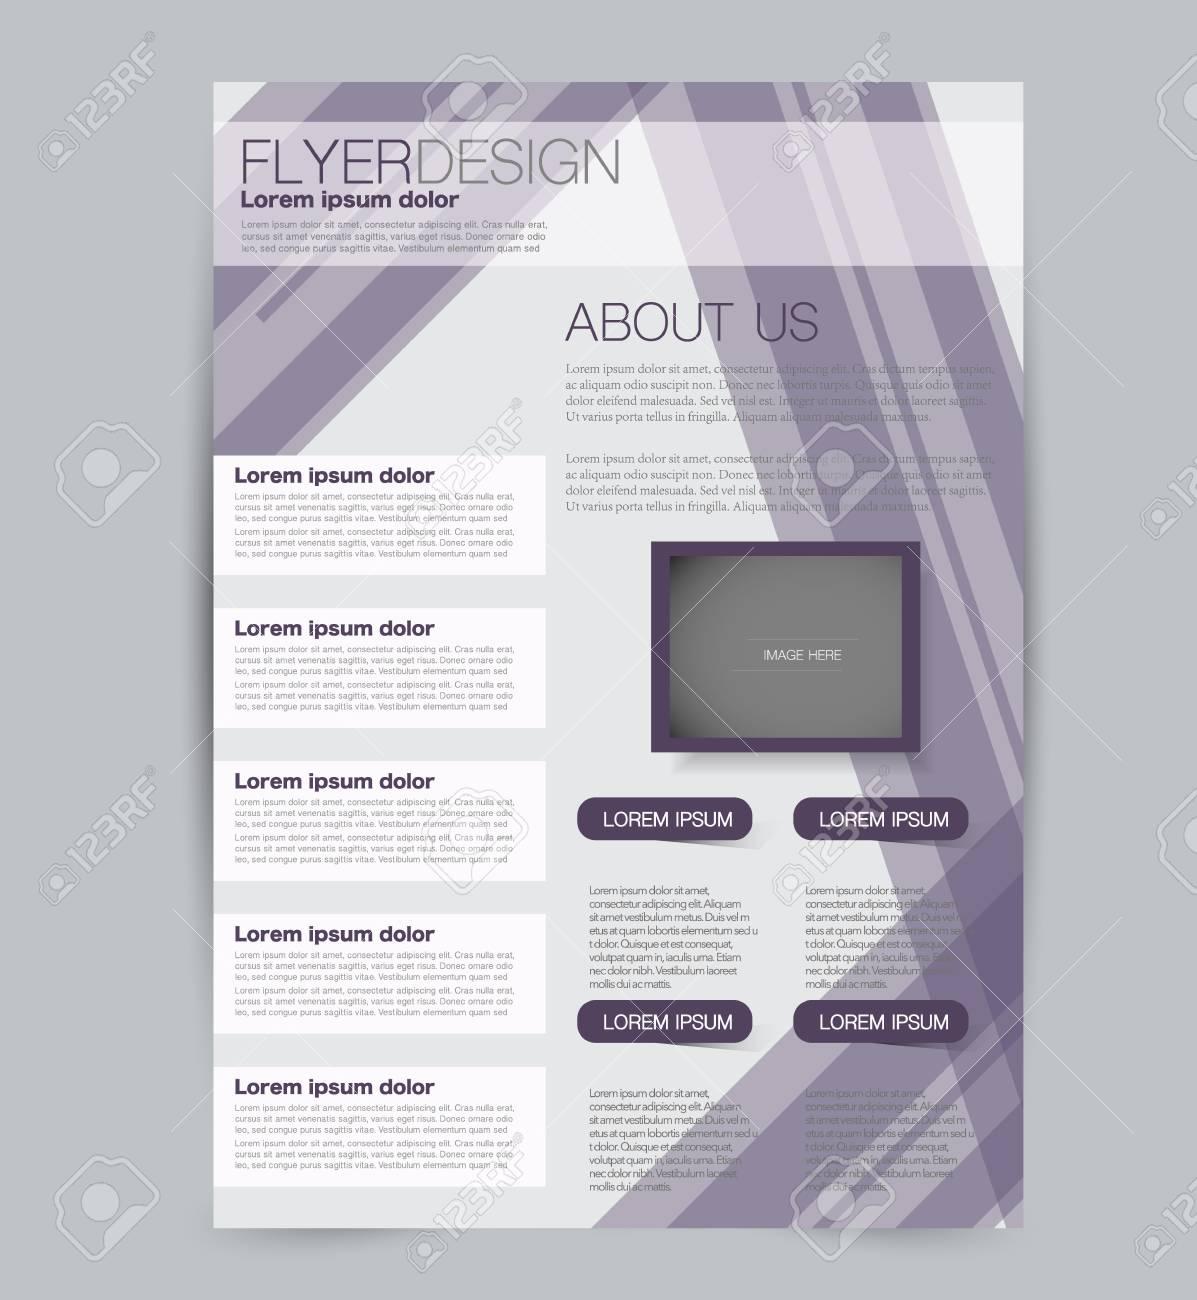 Flyer template. Design for a business, education, advertisement brochure, poster or pamphlet. Vector illustration. Purple color. - 126878930